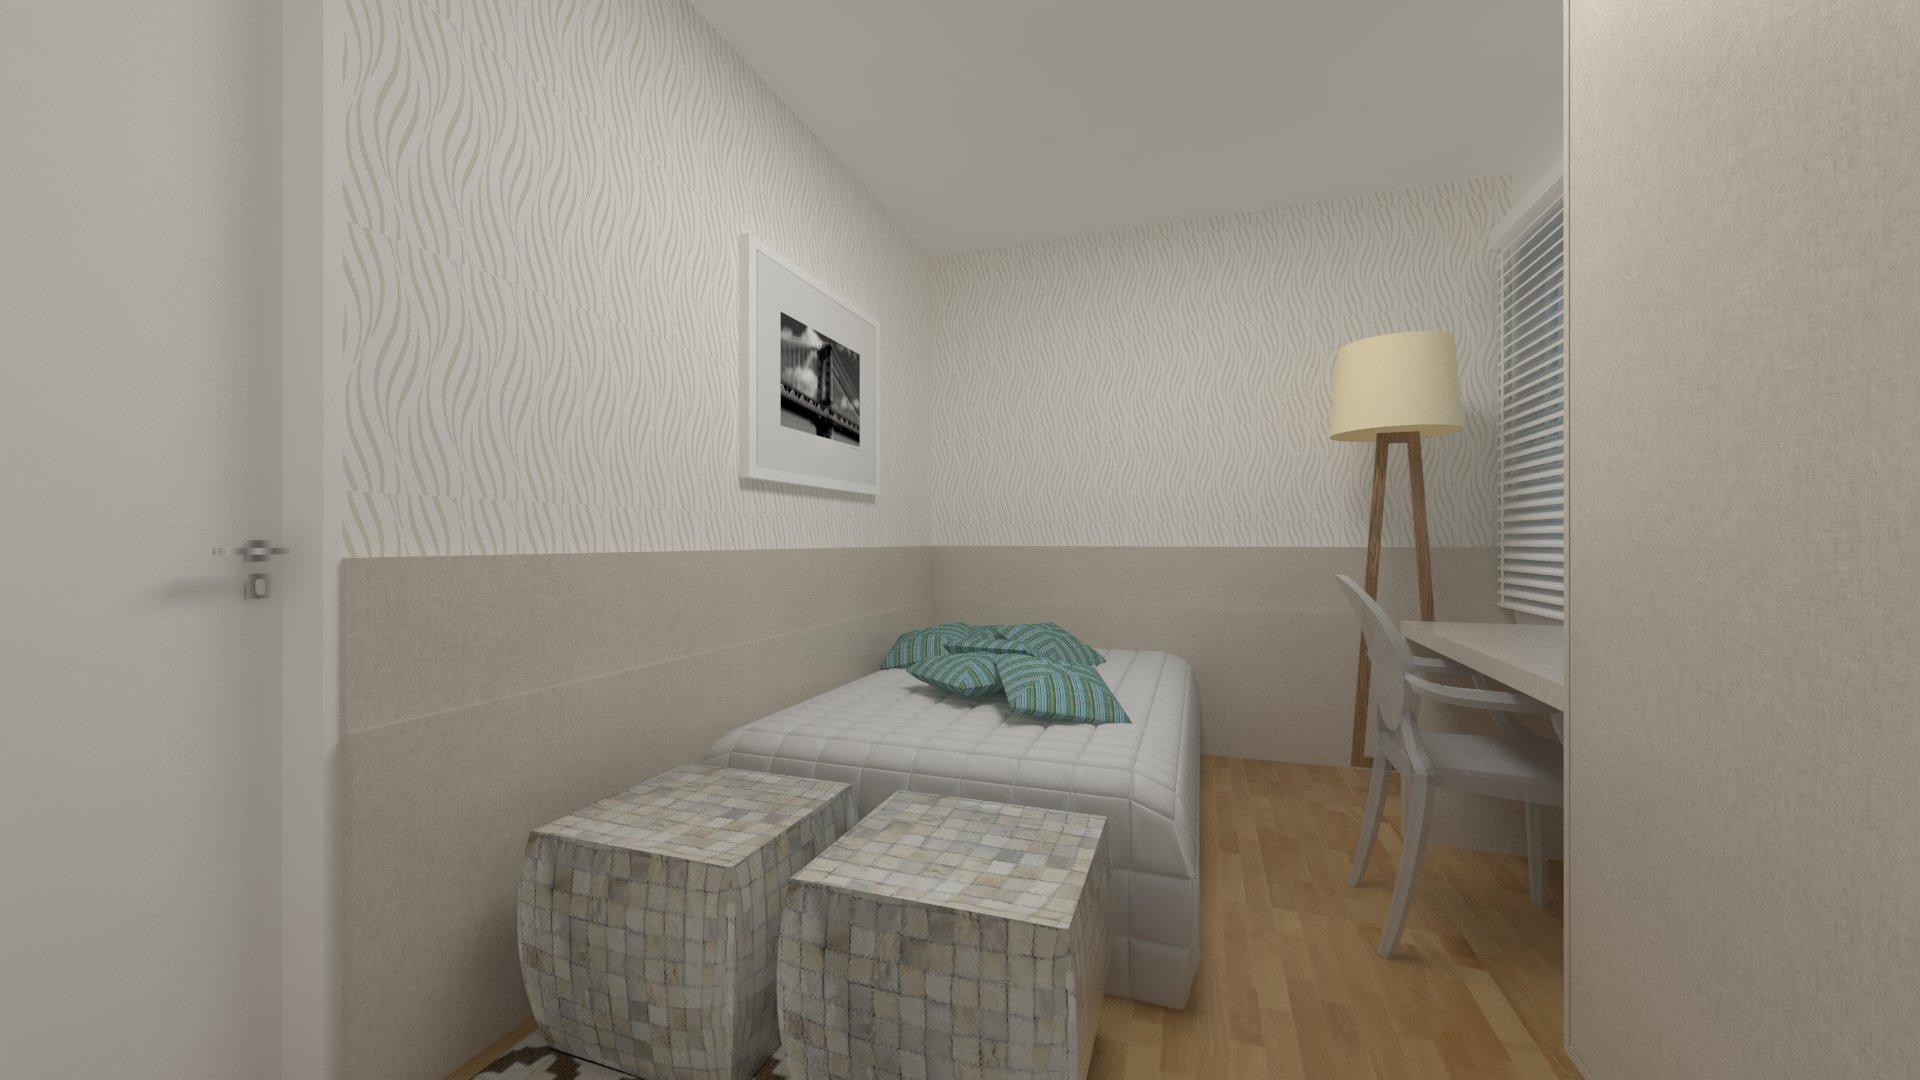 Ap dormitorio hospedes 02